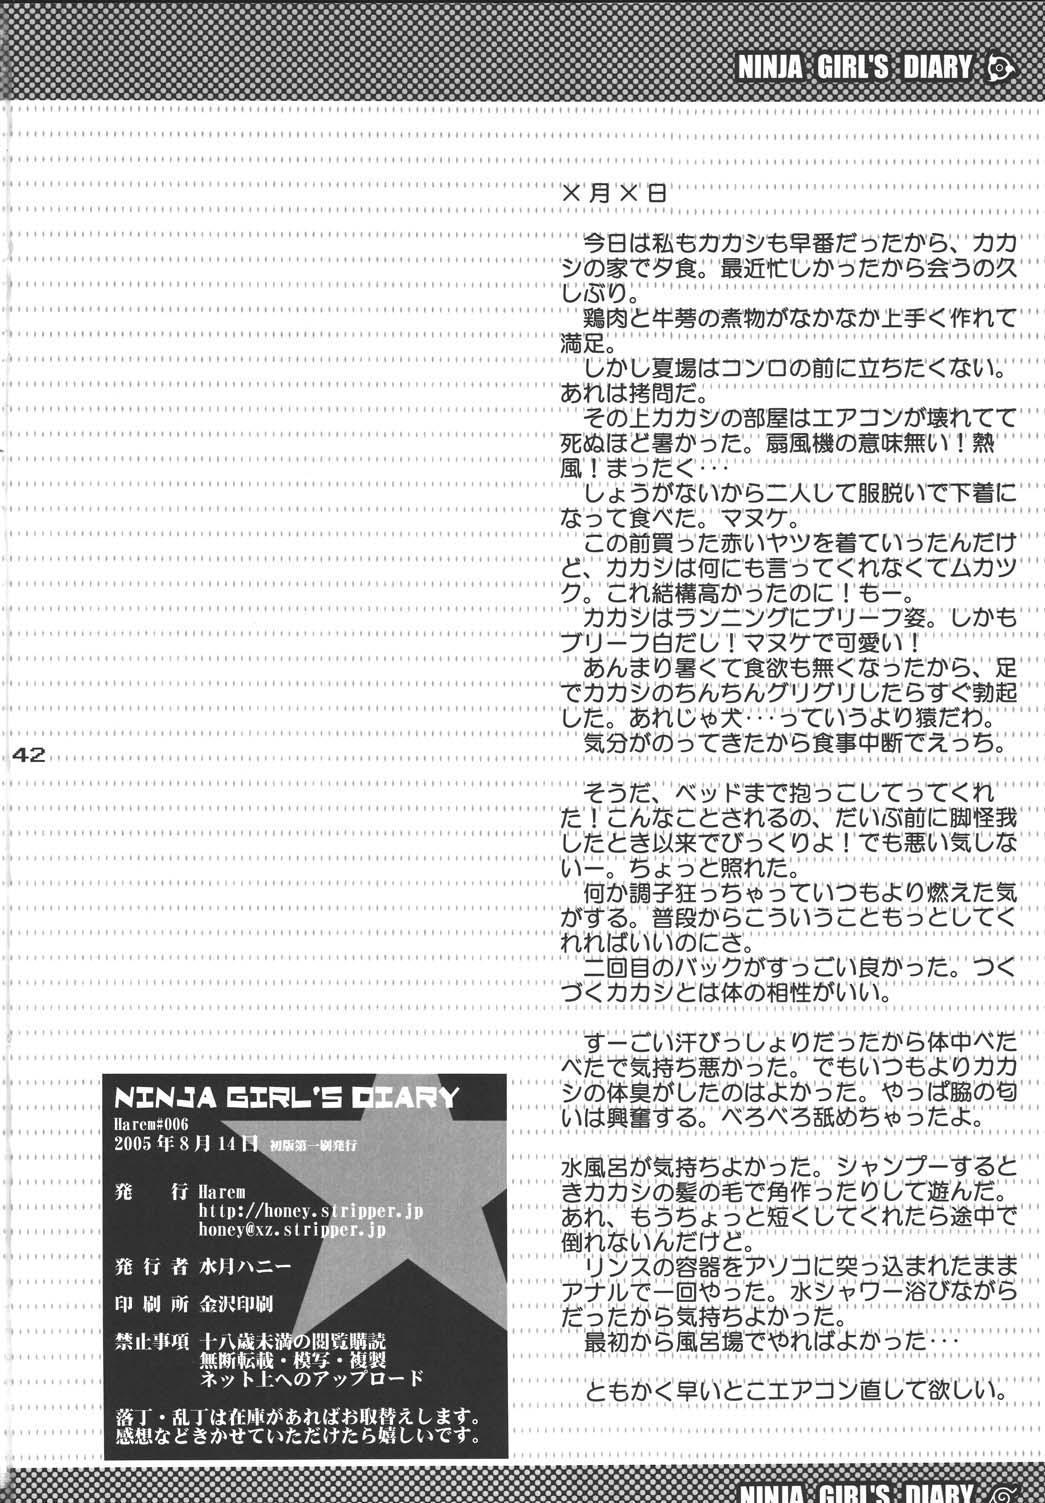 Ninja Girl's Diary 38